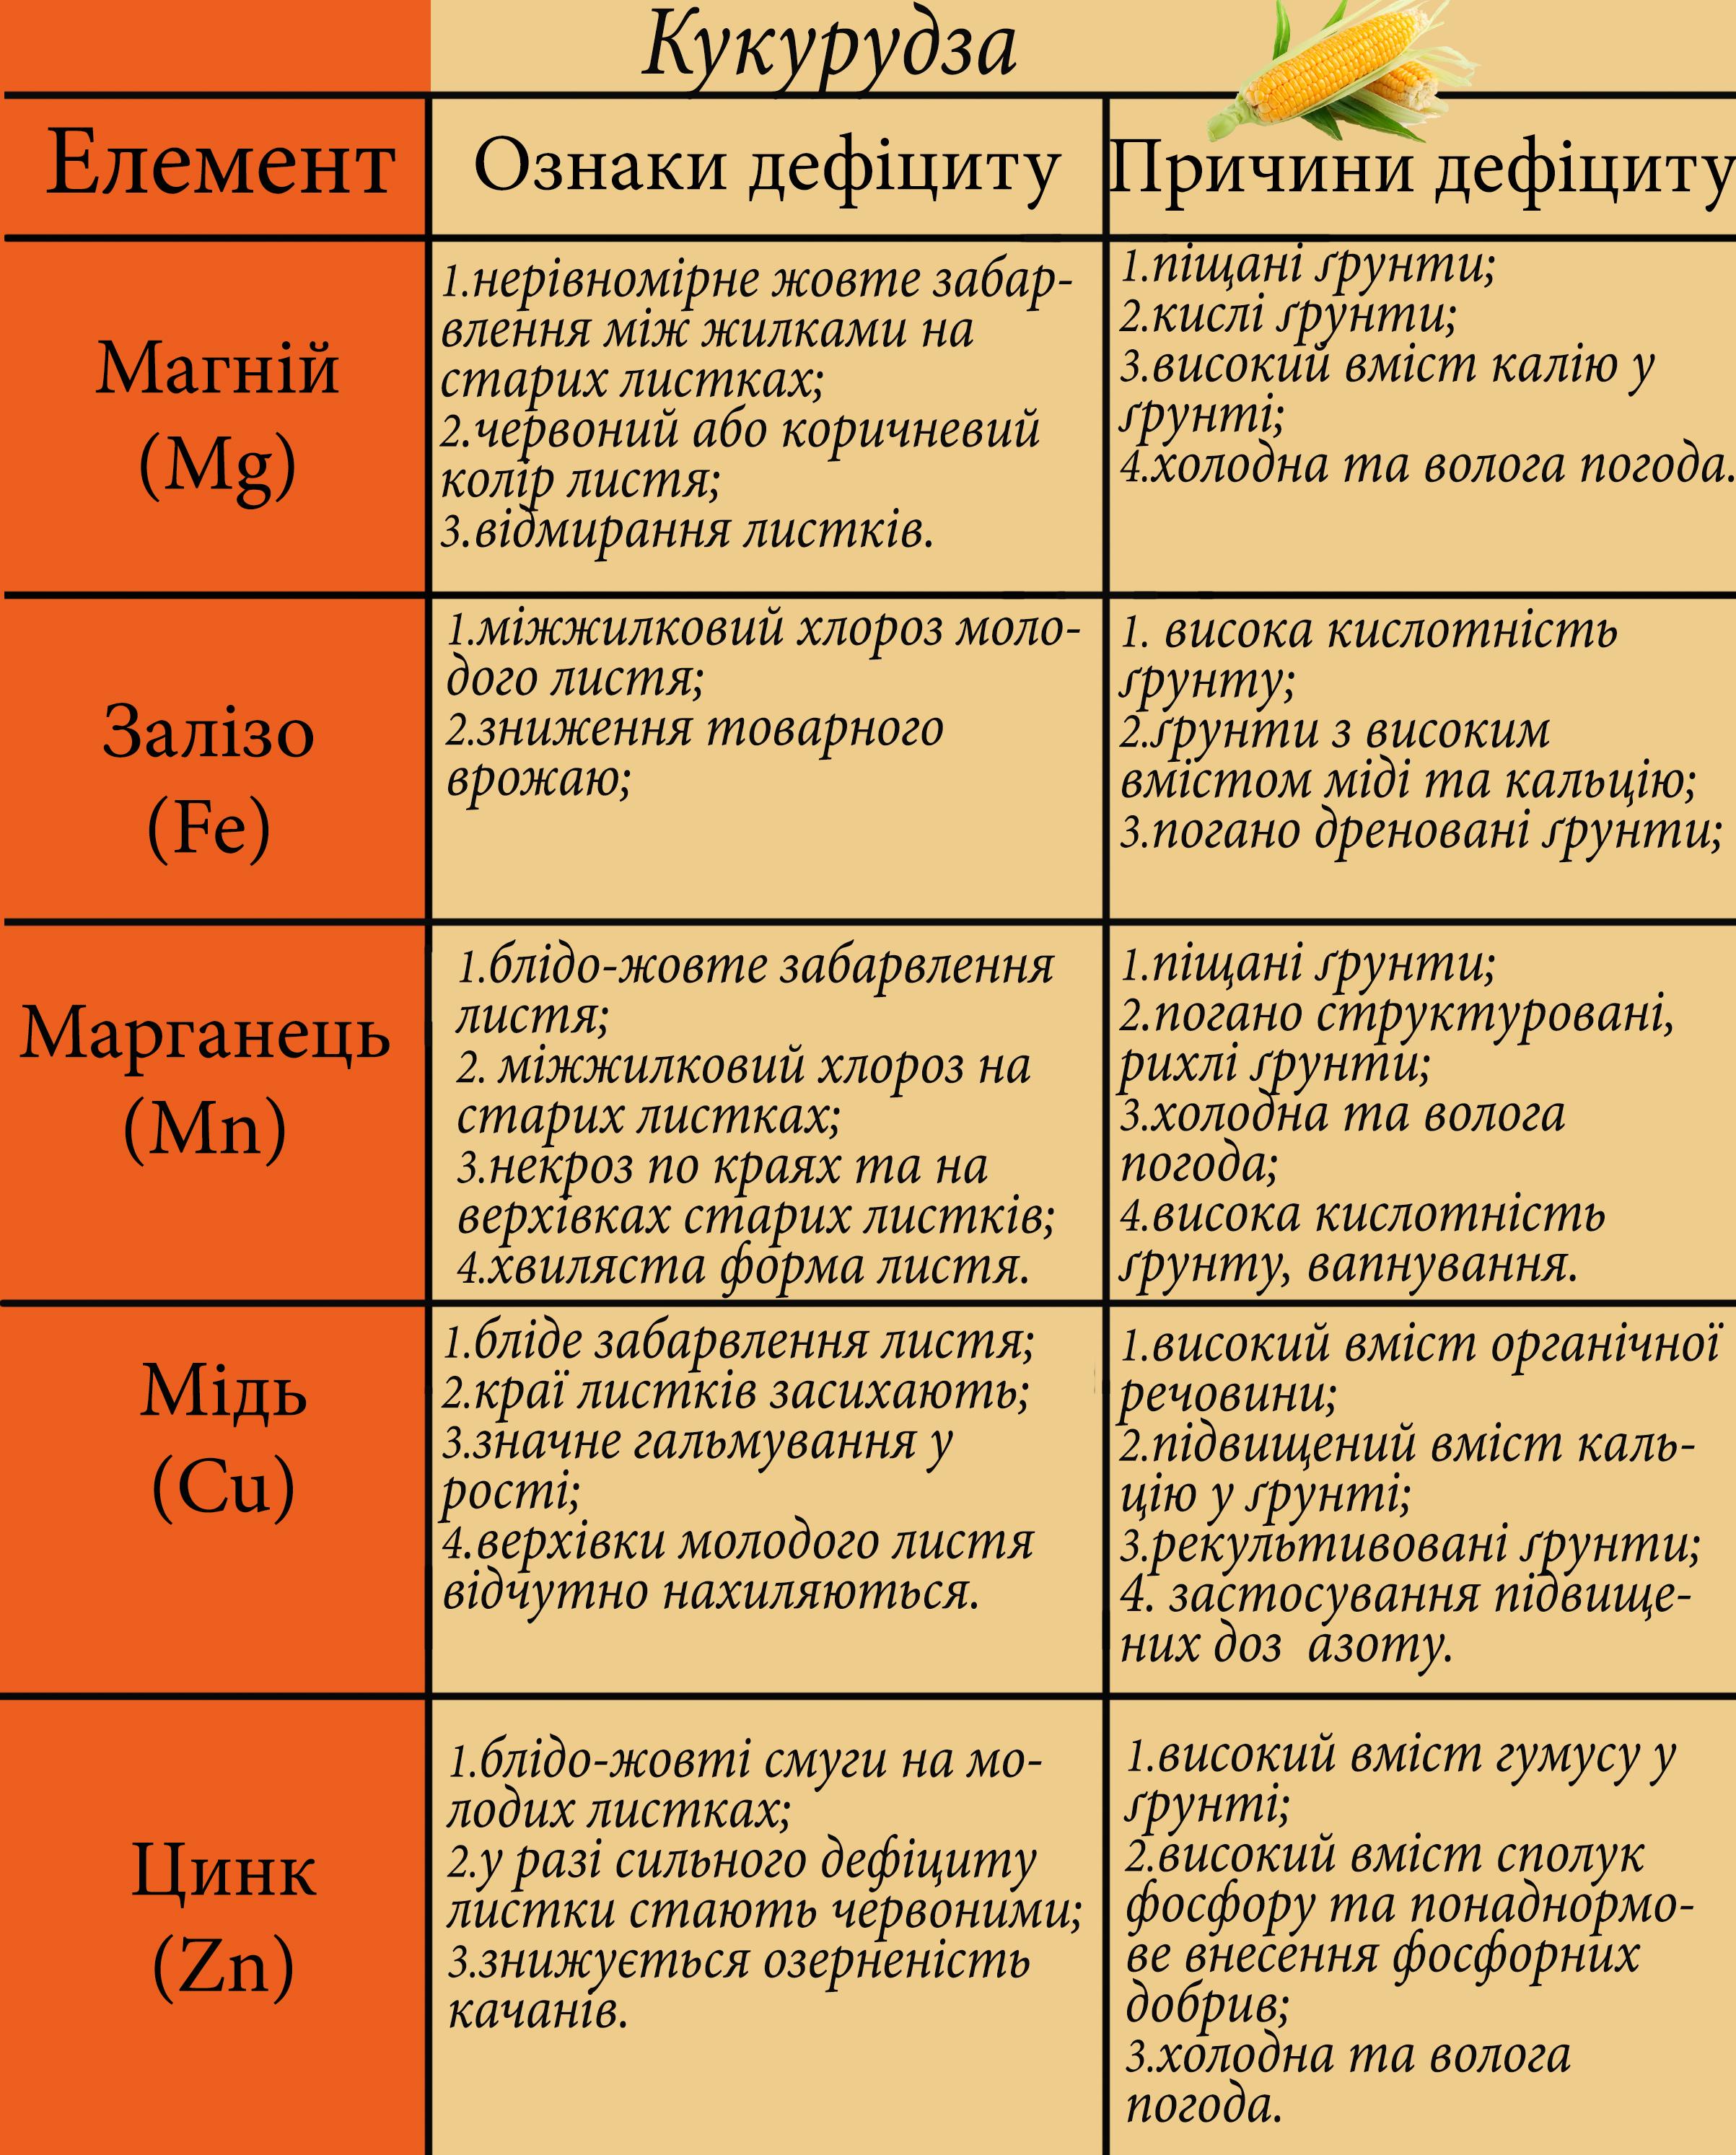 елементи на культурах - кукурудза